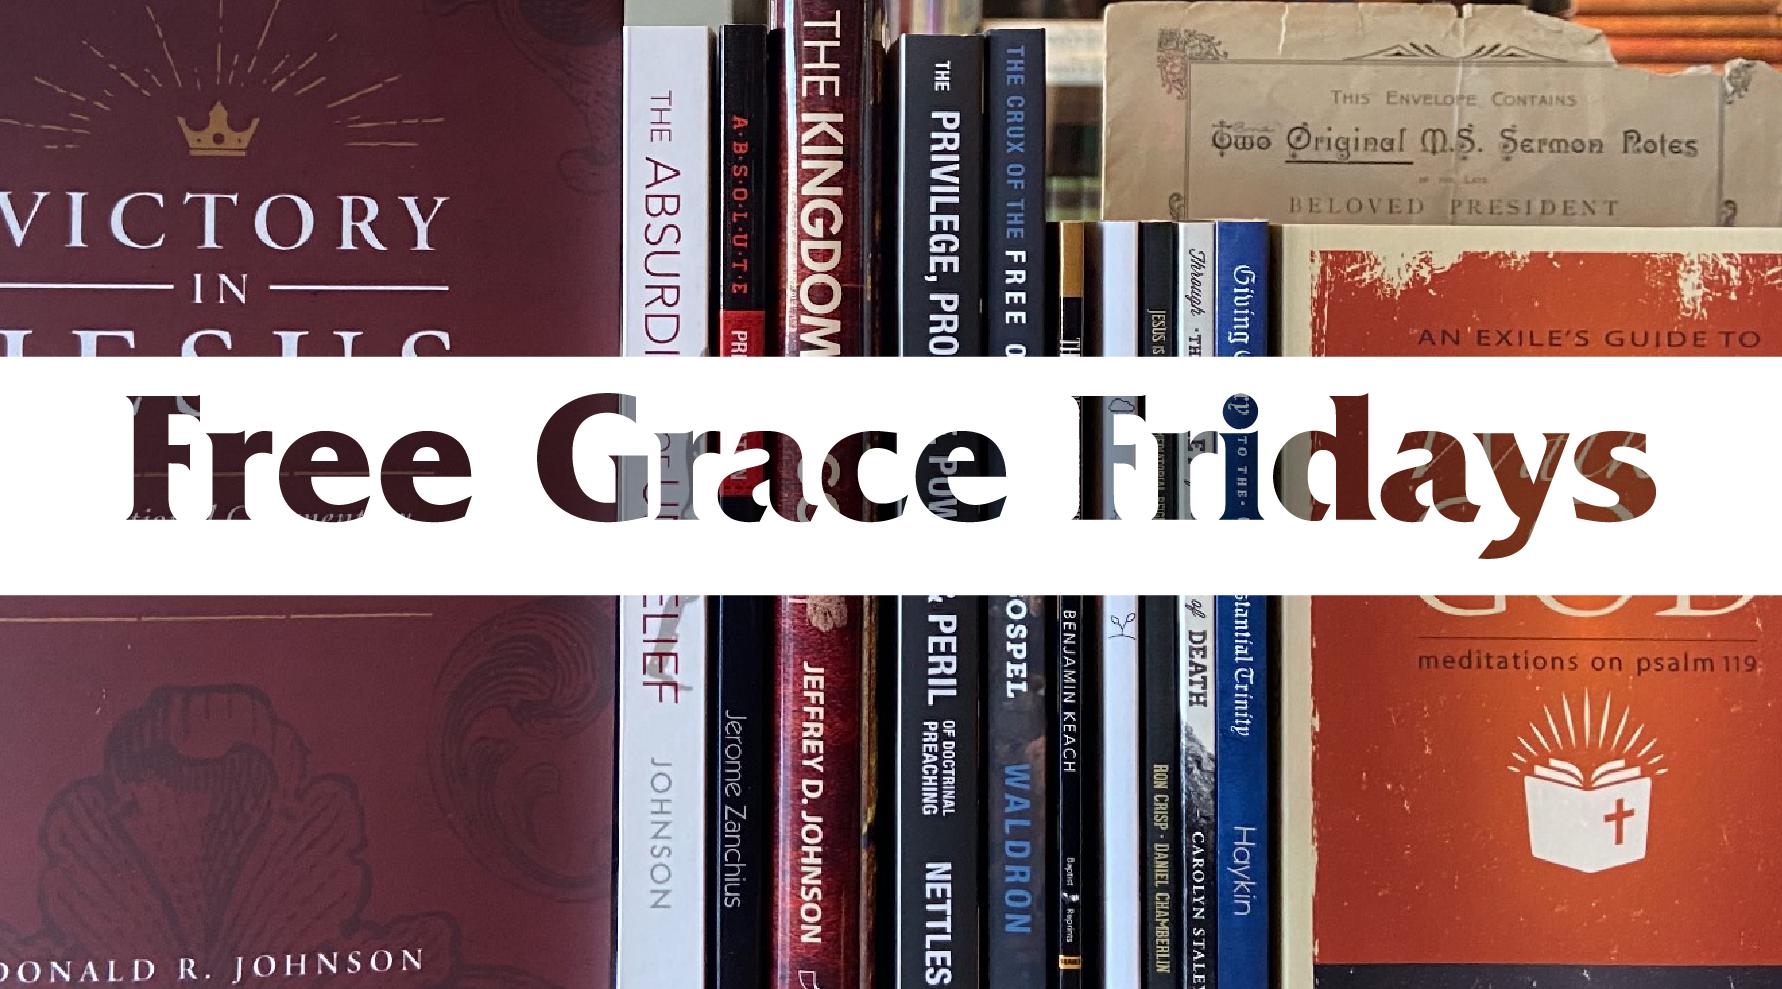 Free Grace Fridays